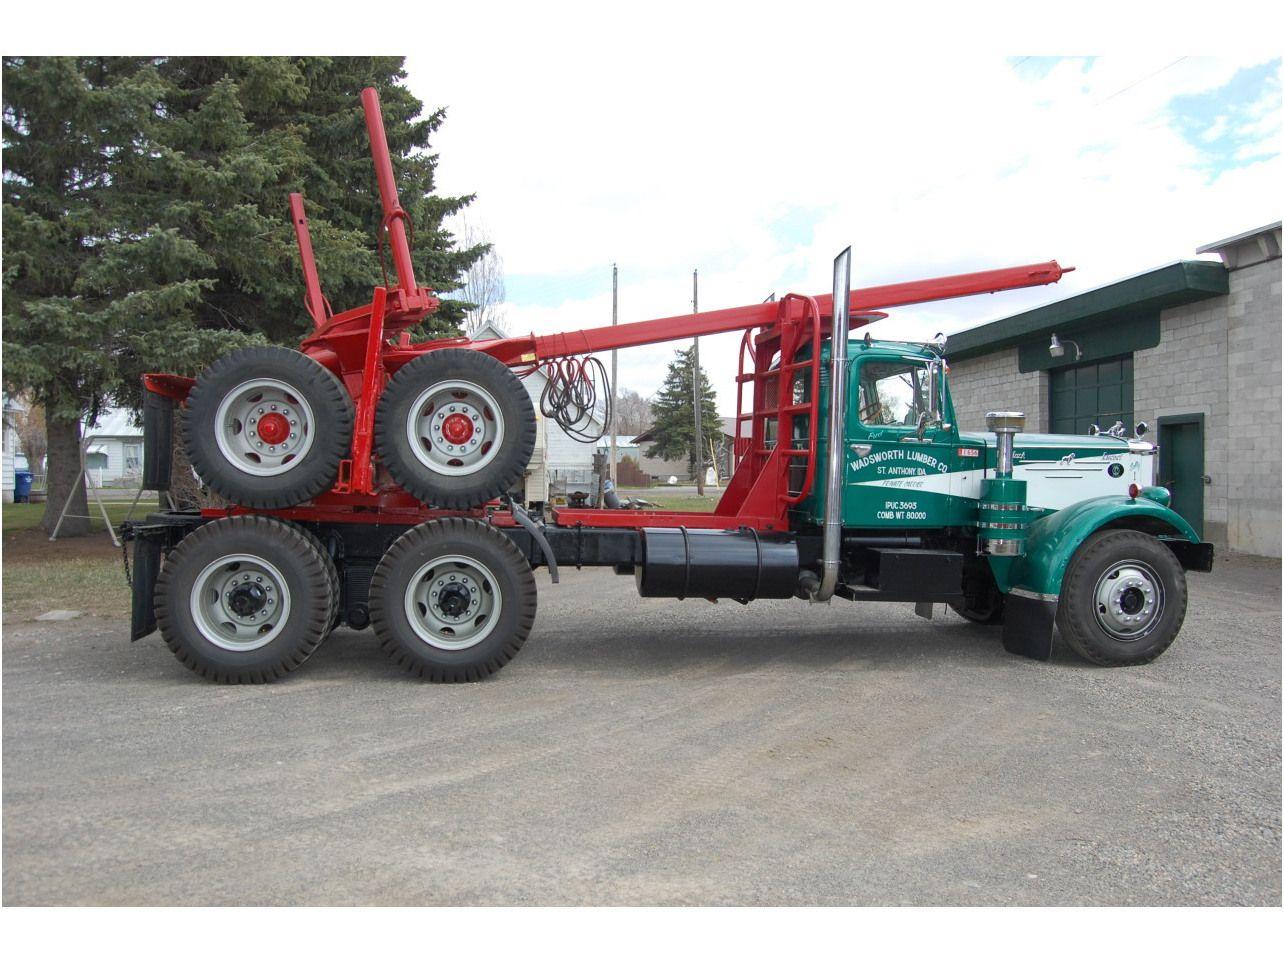 logging+trucks | MACK LT Logging Truck - Double Edge Equipment LLC ...